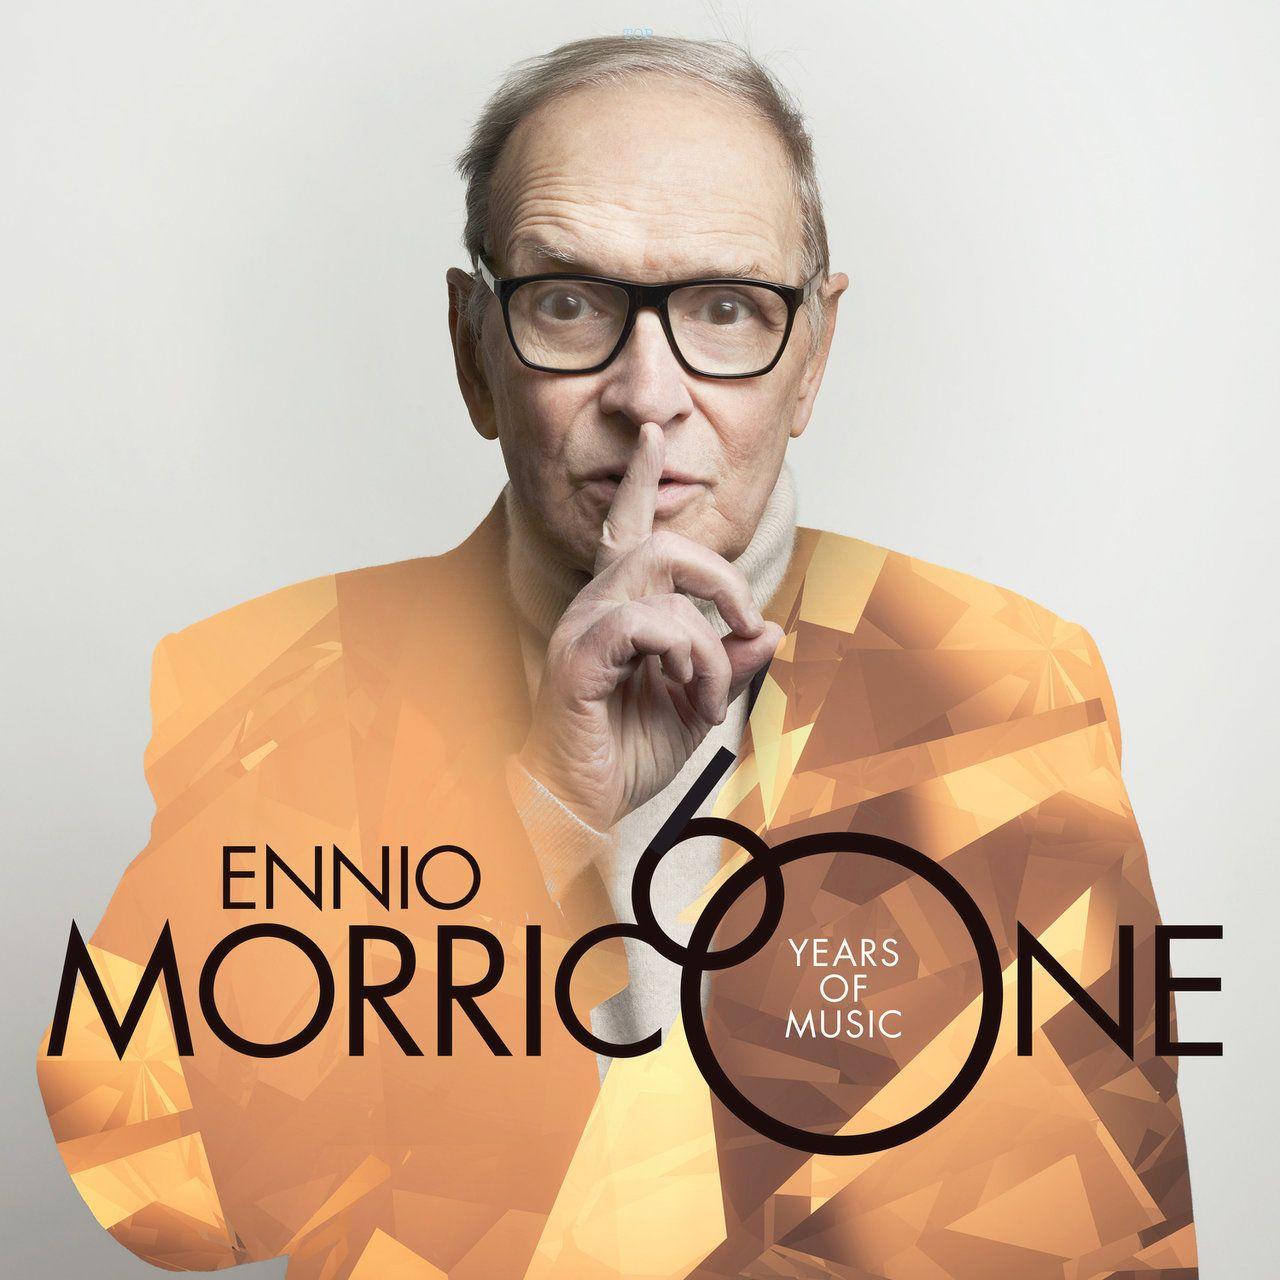 Ennio Morricone - Morricone 60 album cover